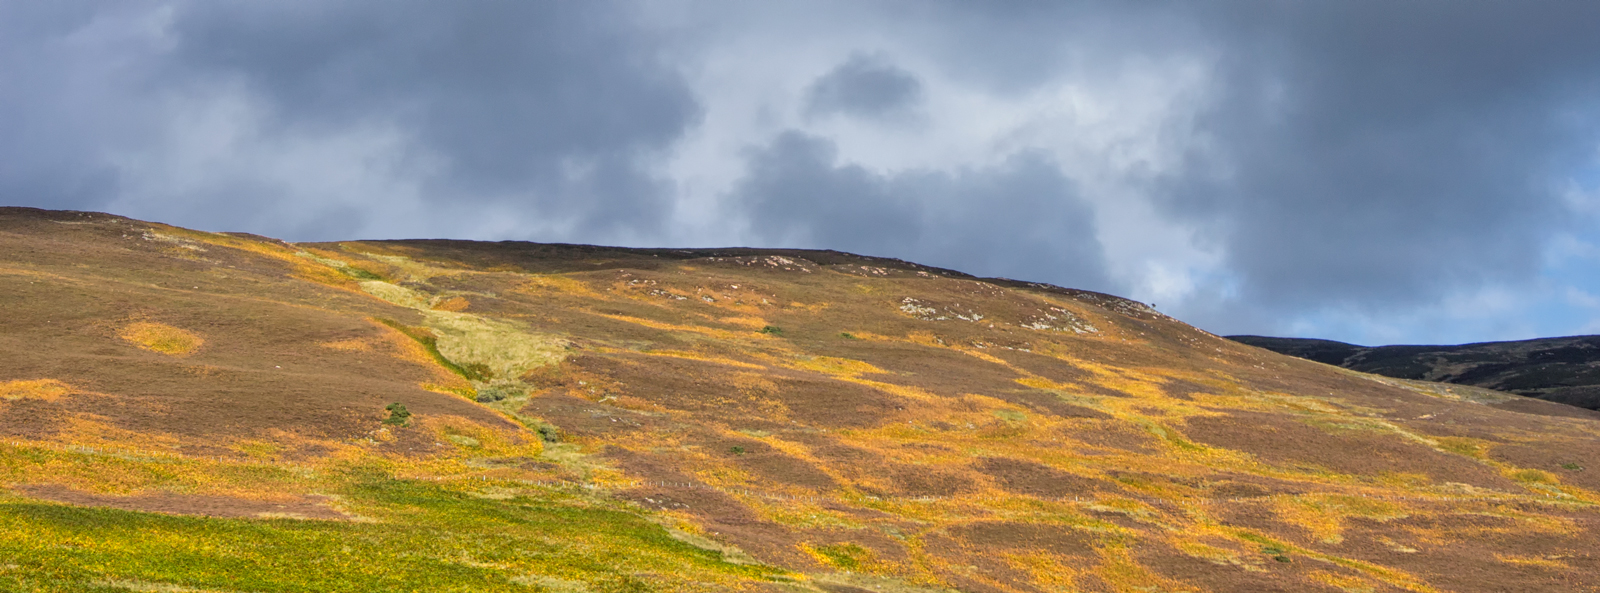 1058-Schotland34_WMP